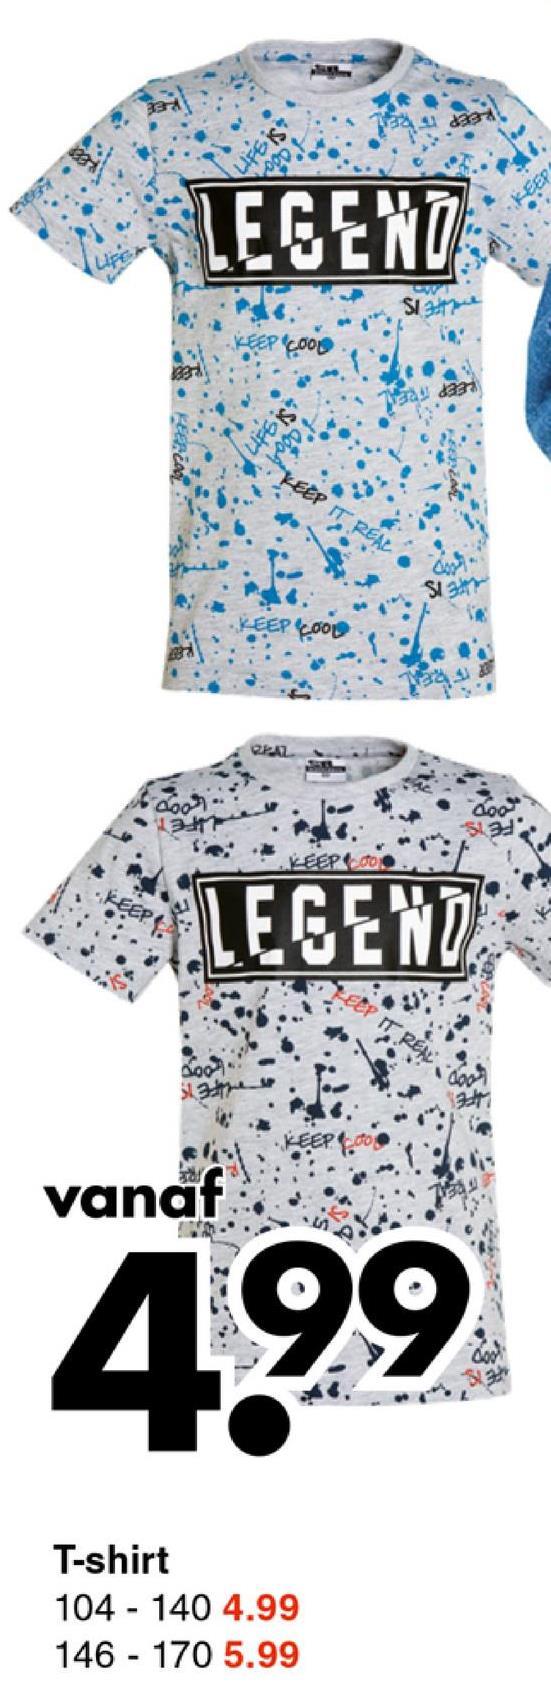 9500 LEGEND KEEP C00 TE KEEP.00 TESETT CEP IT PEN Sa vanaf 499 T-shirt 104 - 140 4.99 146 - 170 5.99